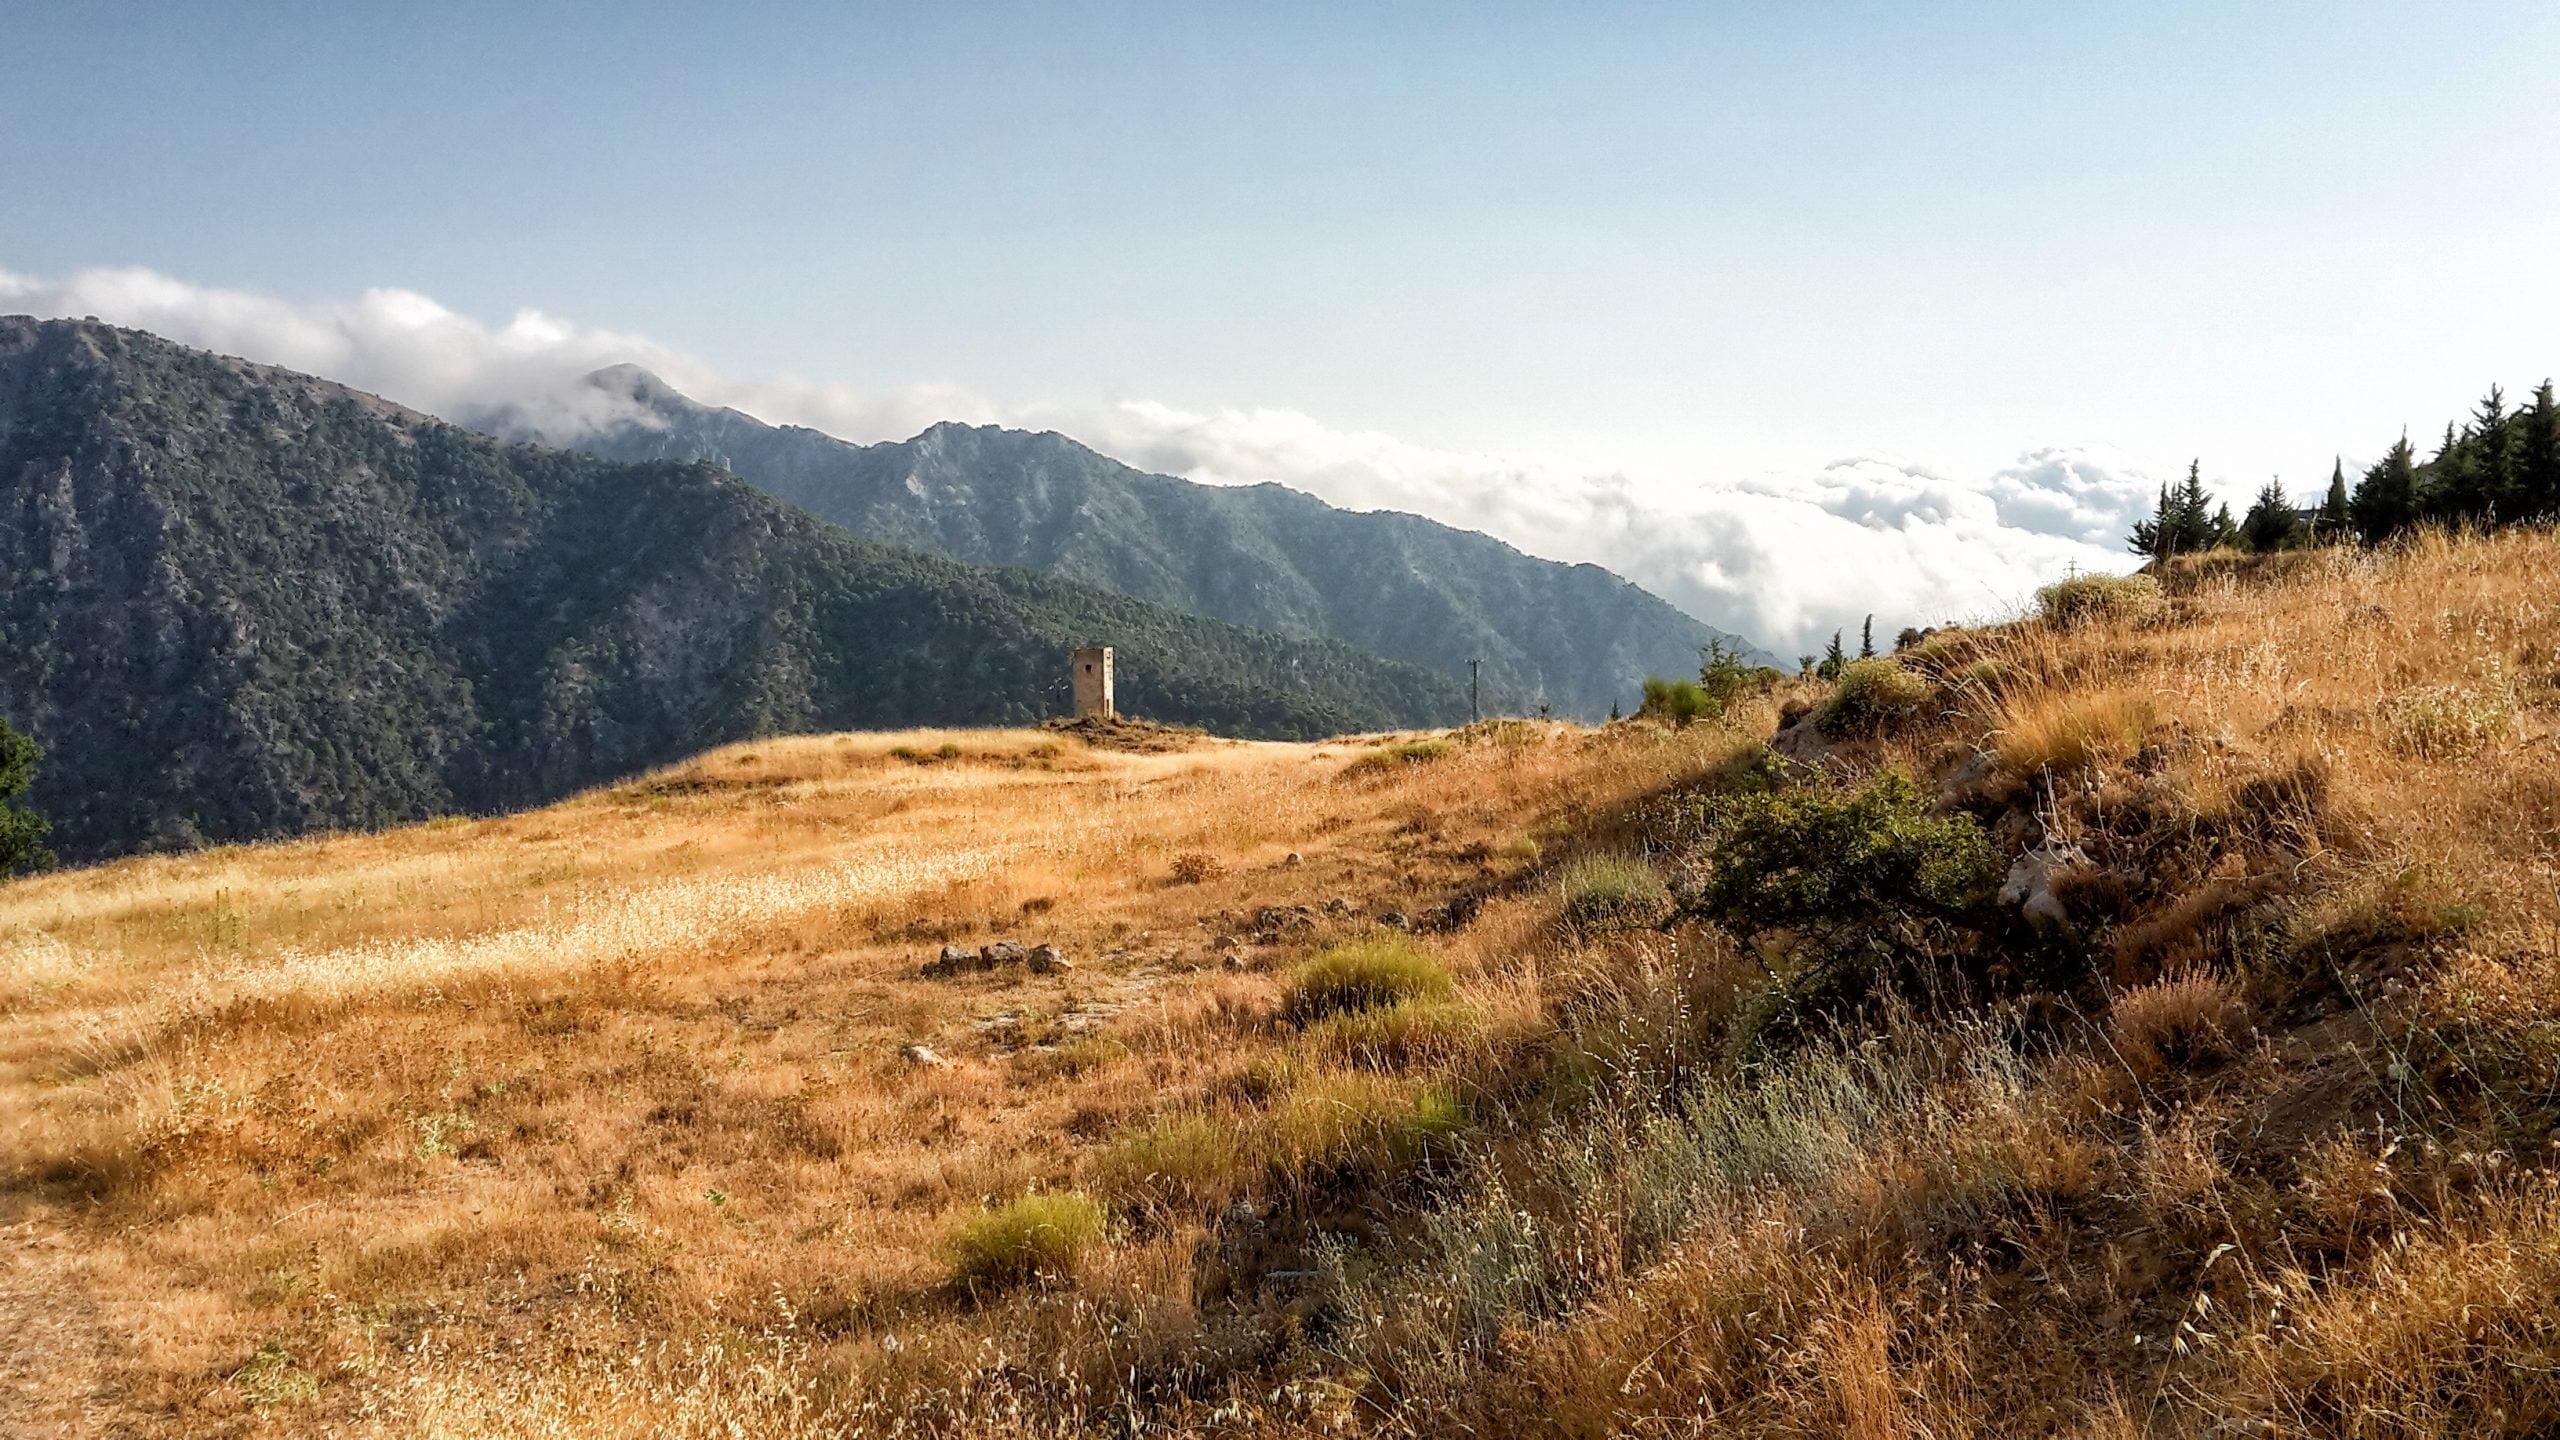 Ontdek de adembenemende Sierra Nevada